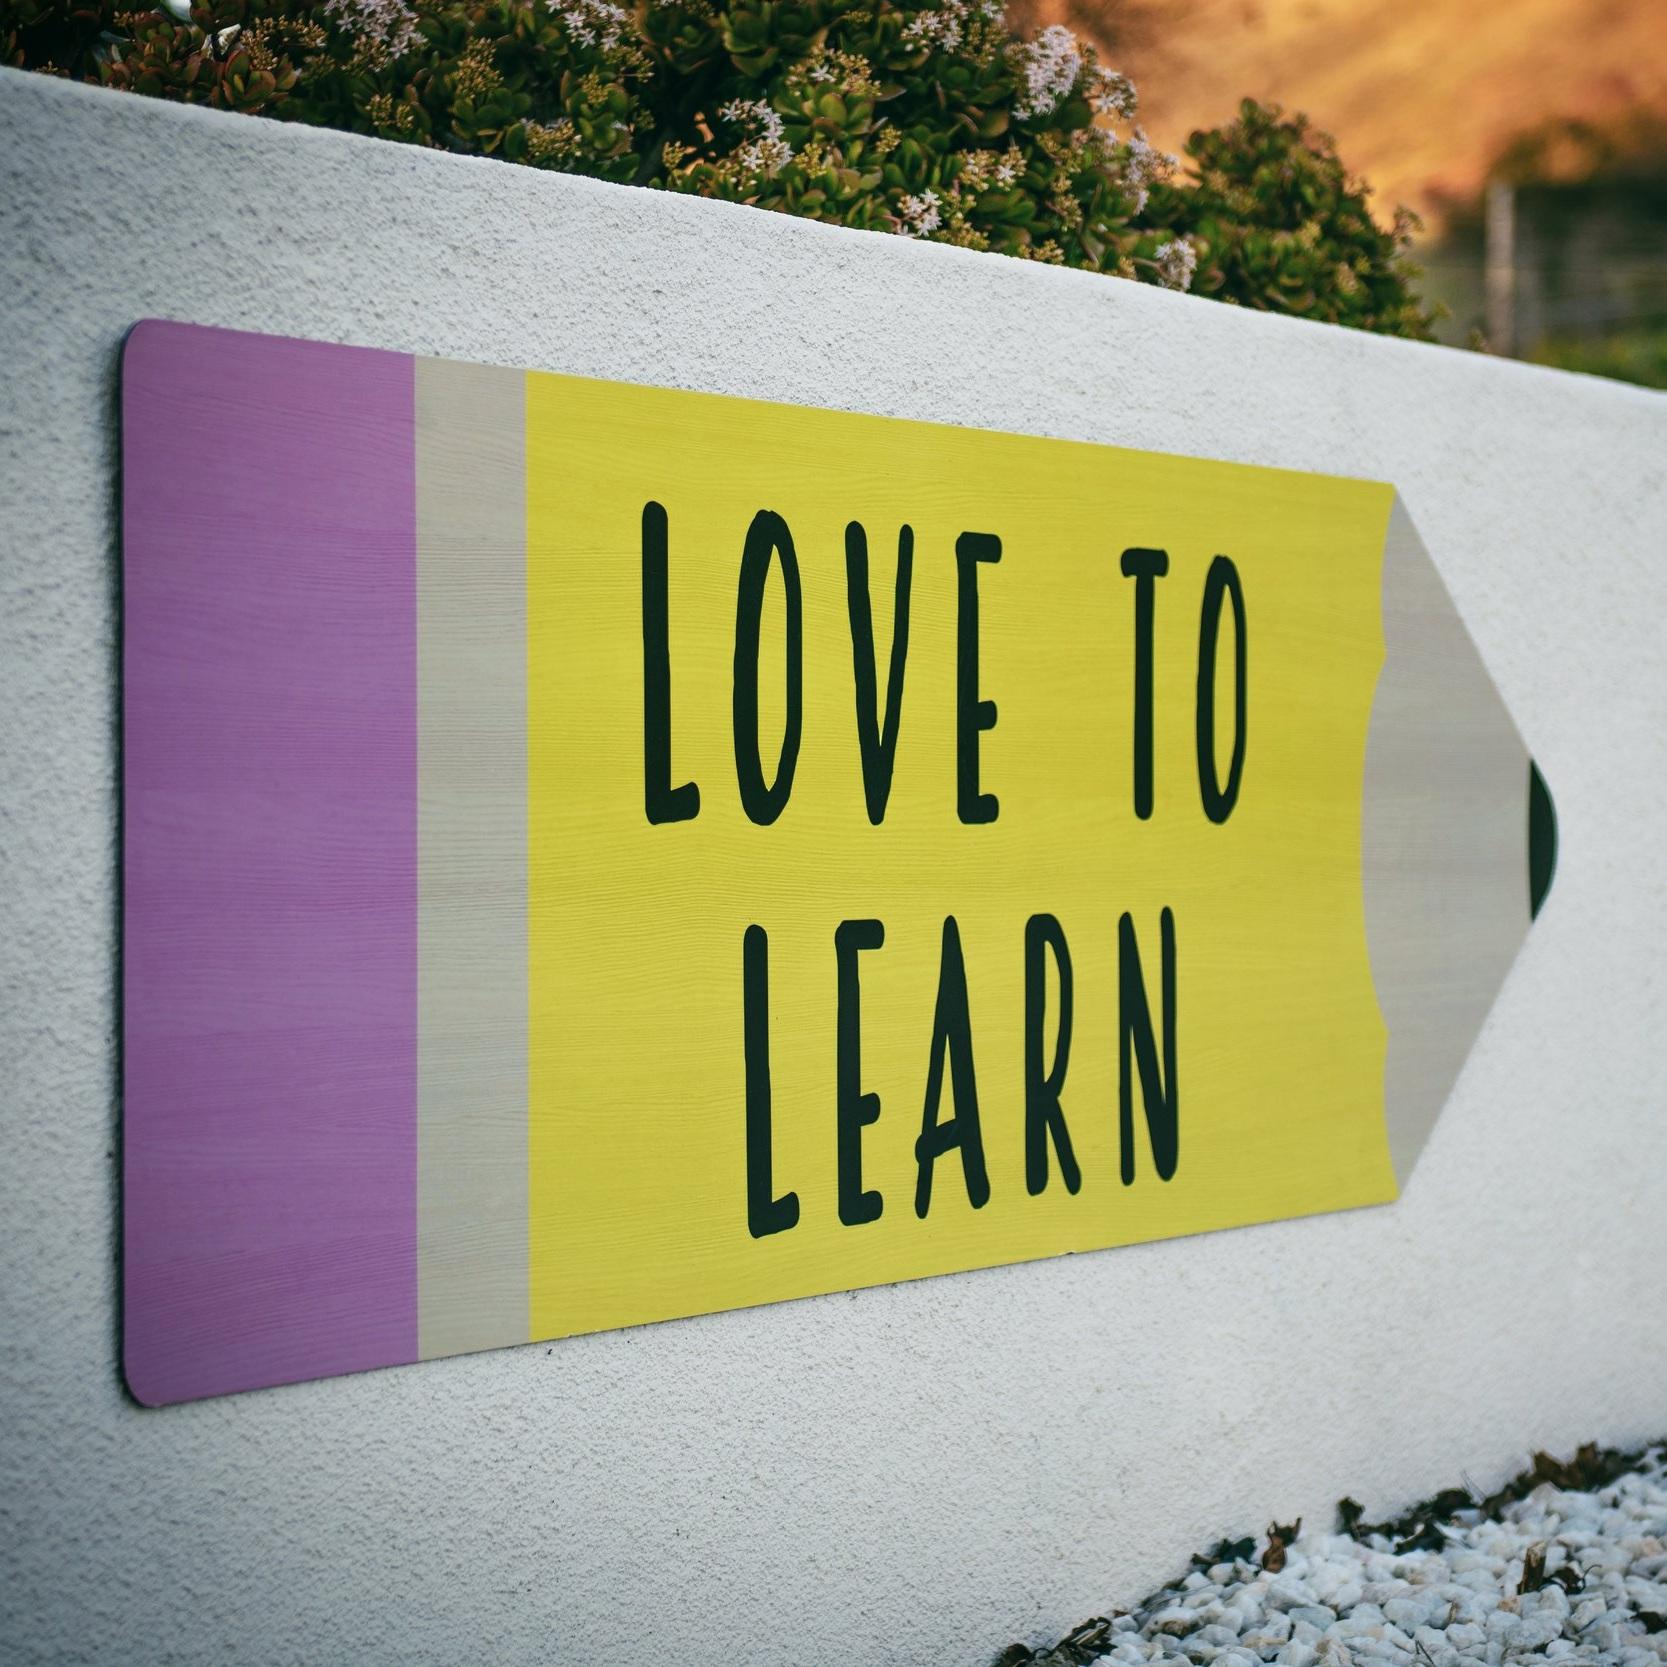 Love+to+learn+tim-mossholder-1265371-unsplash.jpg